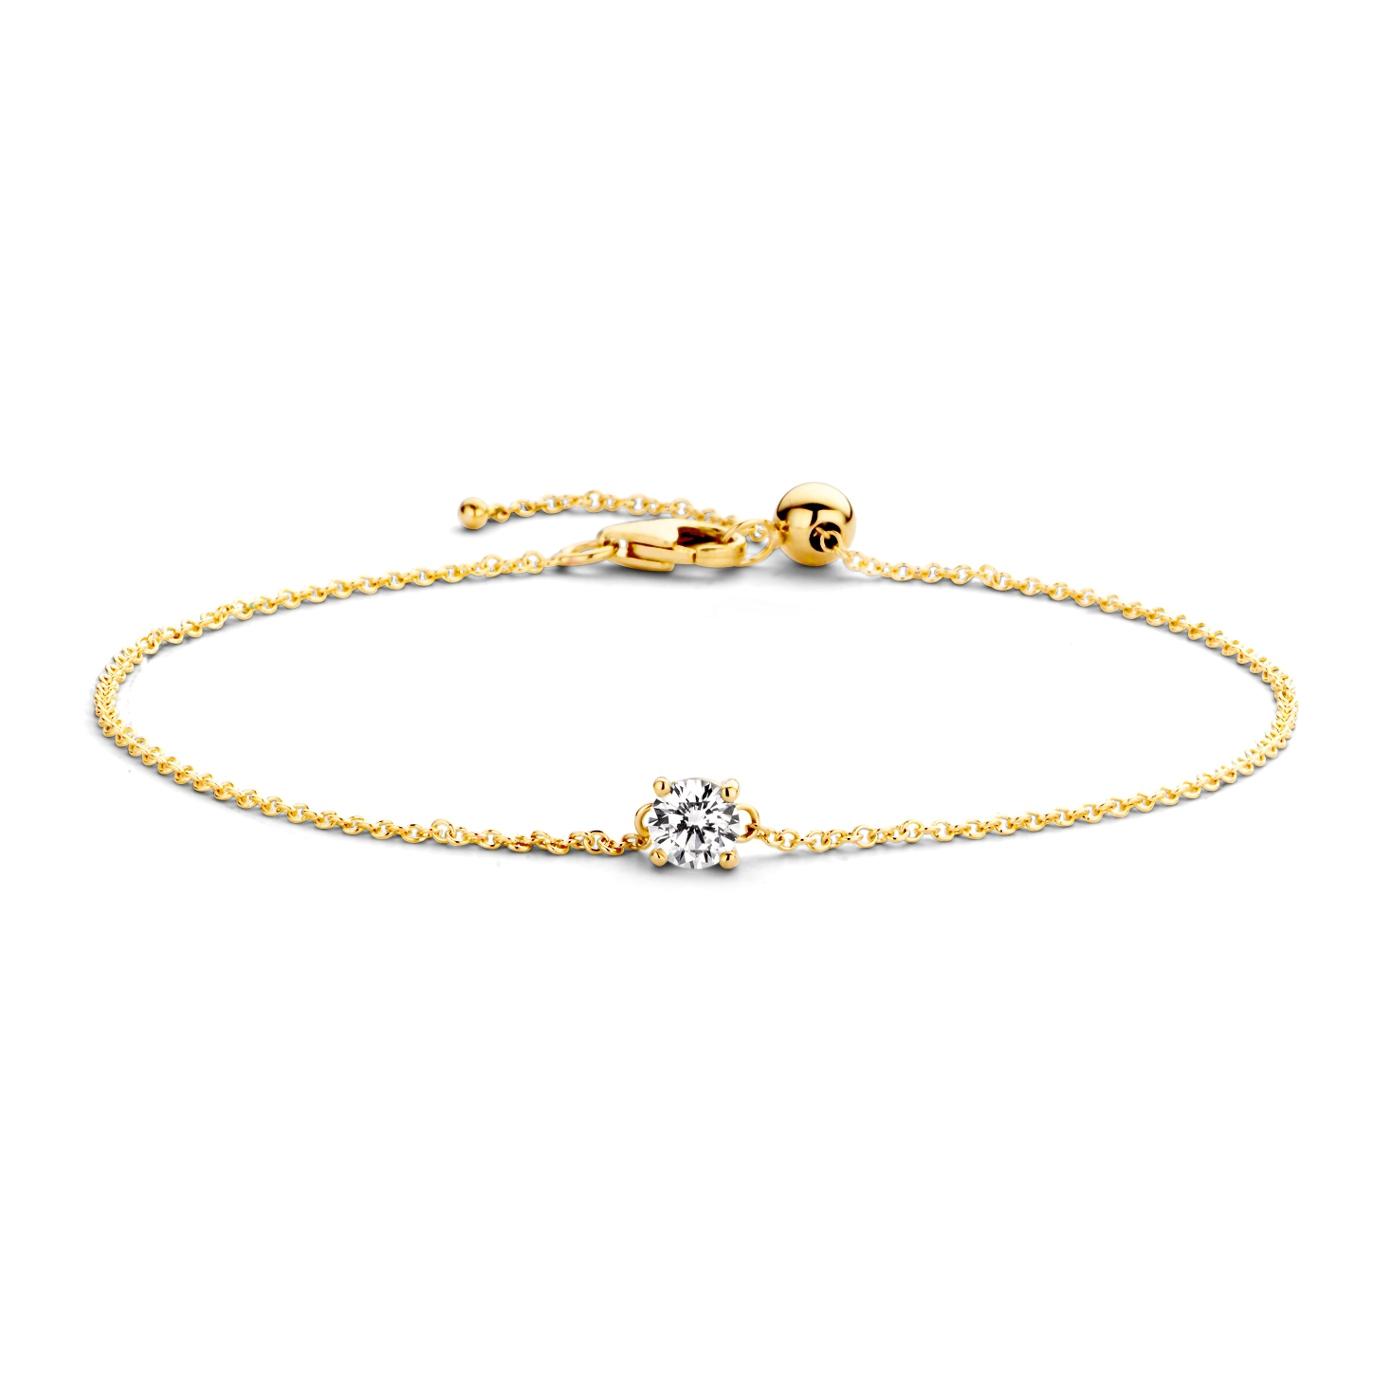 Afbeelding van Blush 14 Karaat Gouden Armband 2166YZI (Lengte: 18.00 cm)